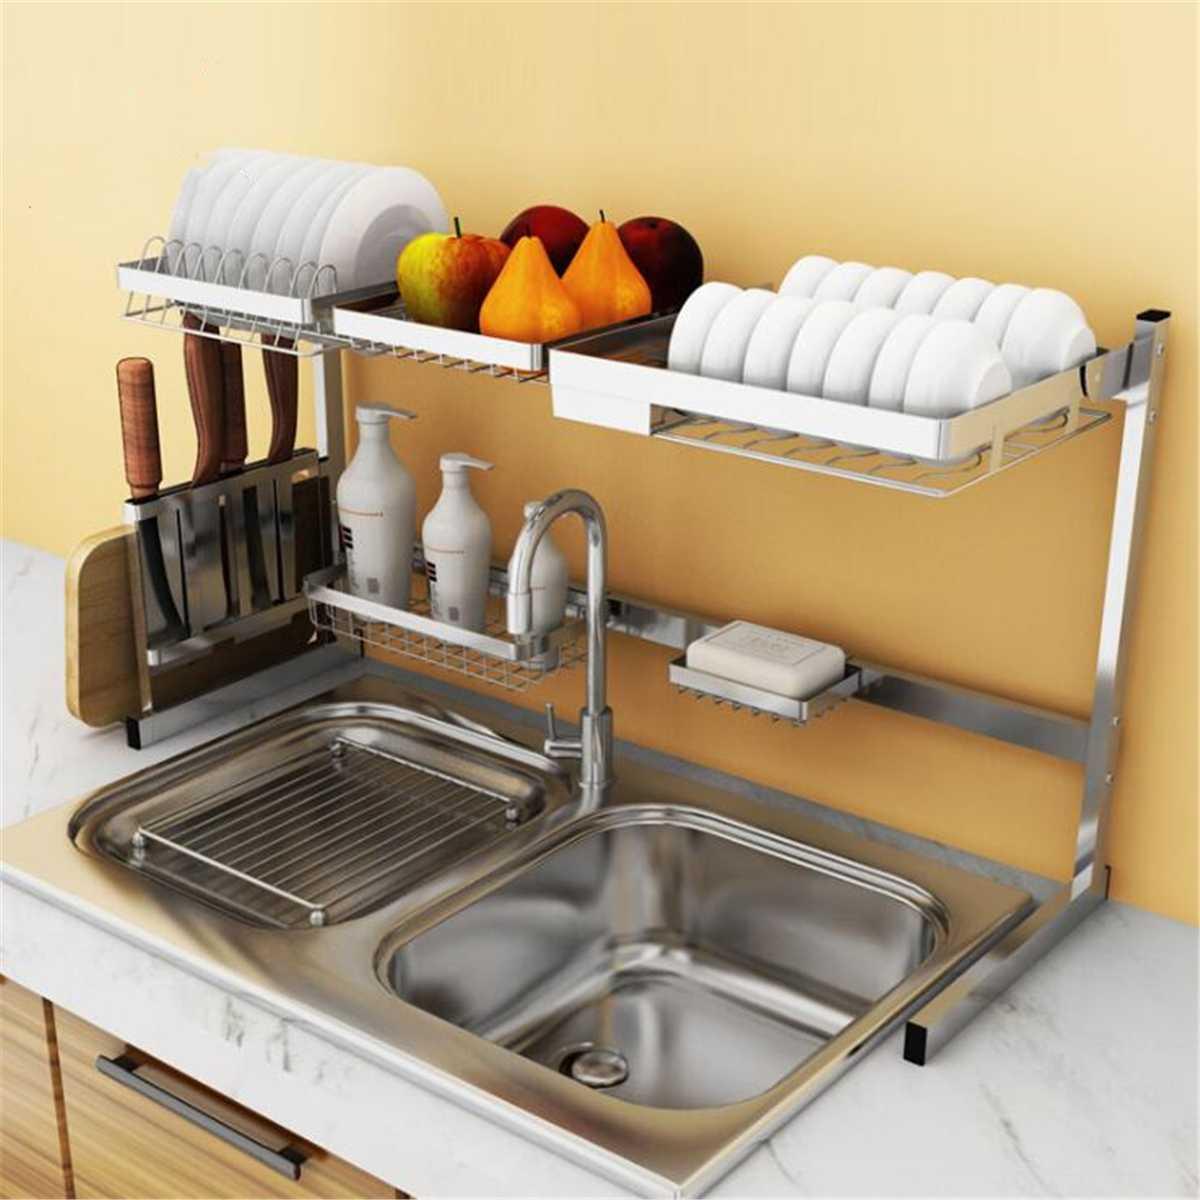 Stainless Steel Kitchen Shelf Storage Holders Bowl Dish Rack Organizer Utensils Storage Supplies Drying Bowl Sink Rack